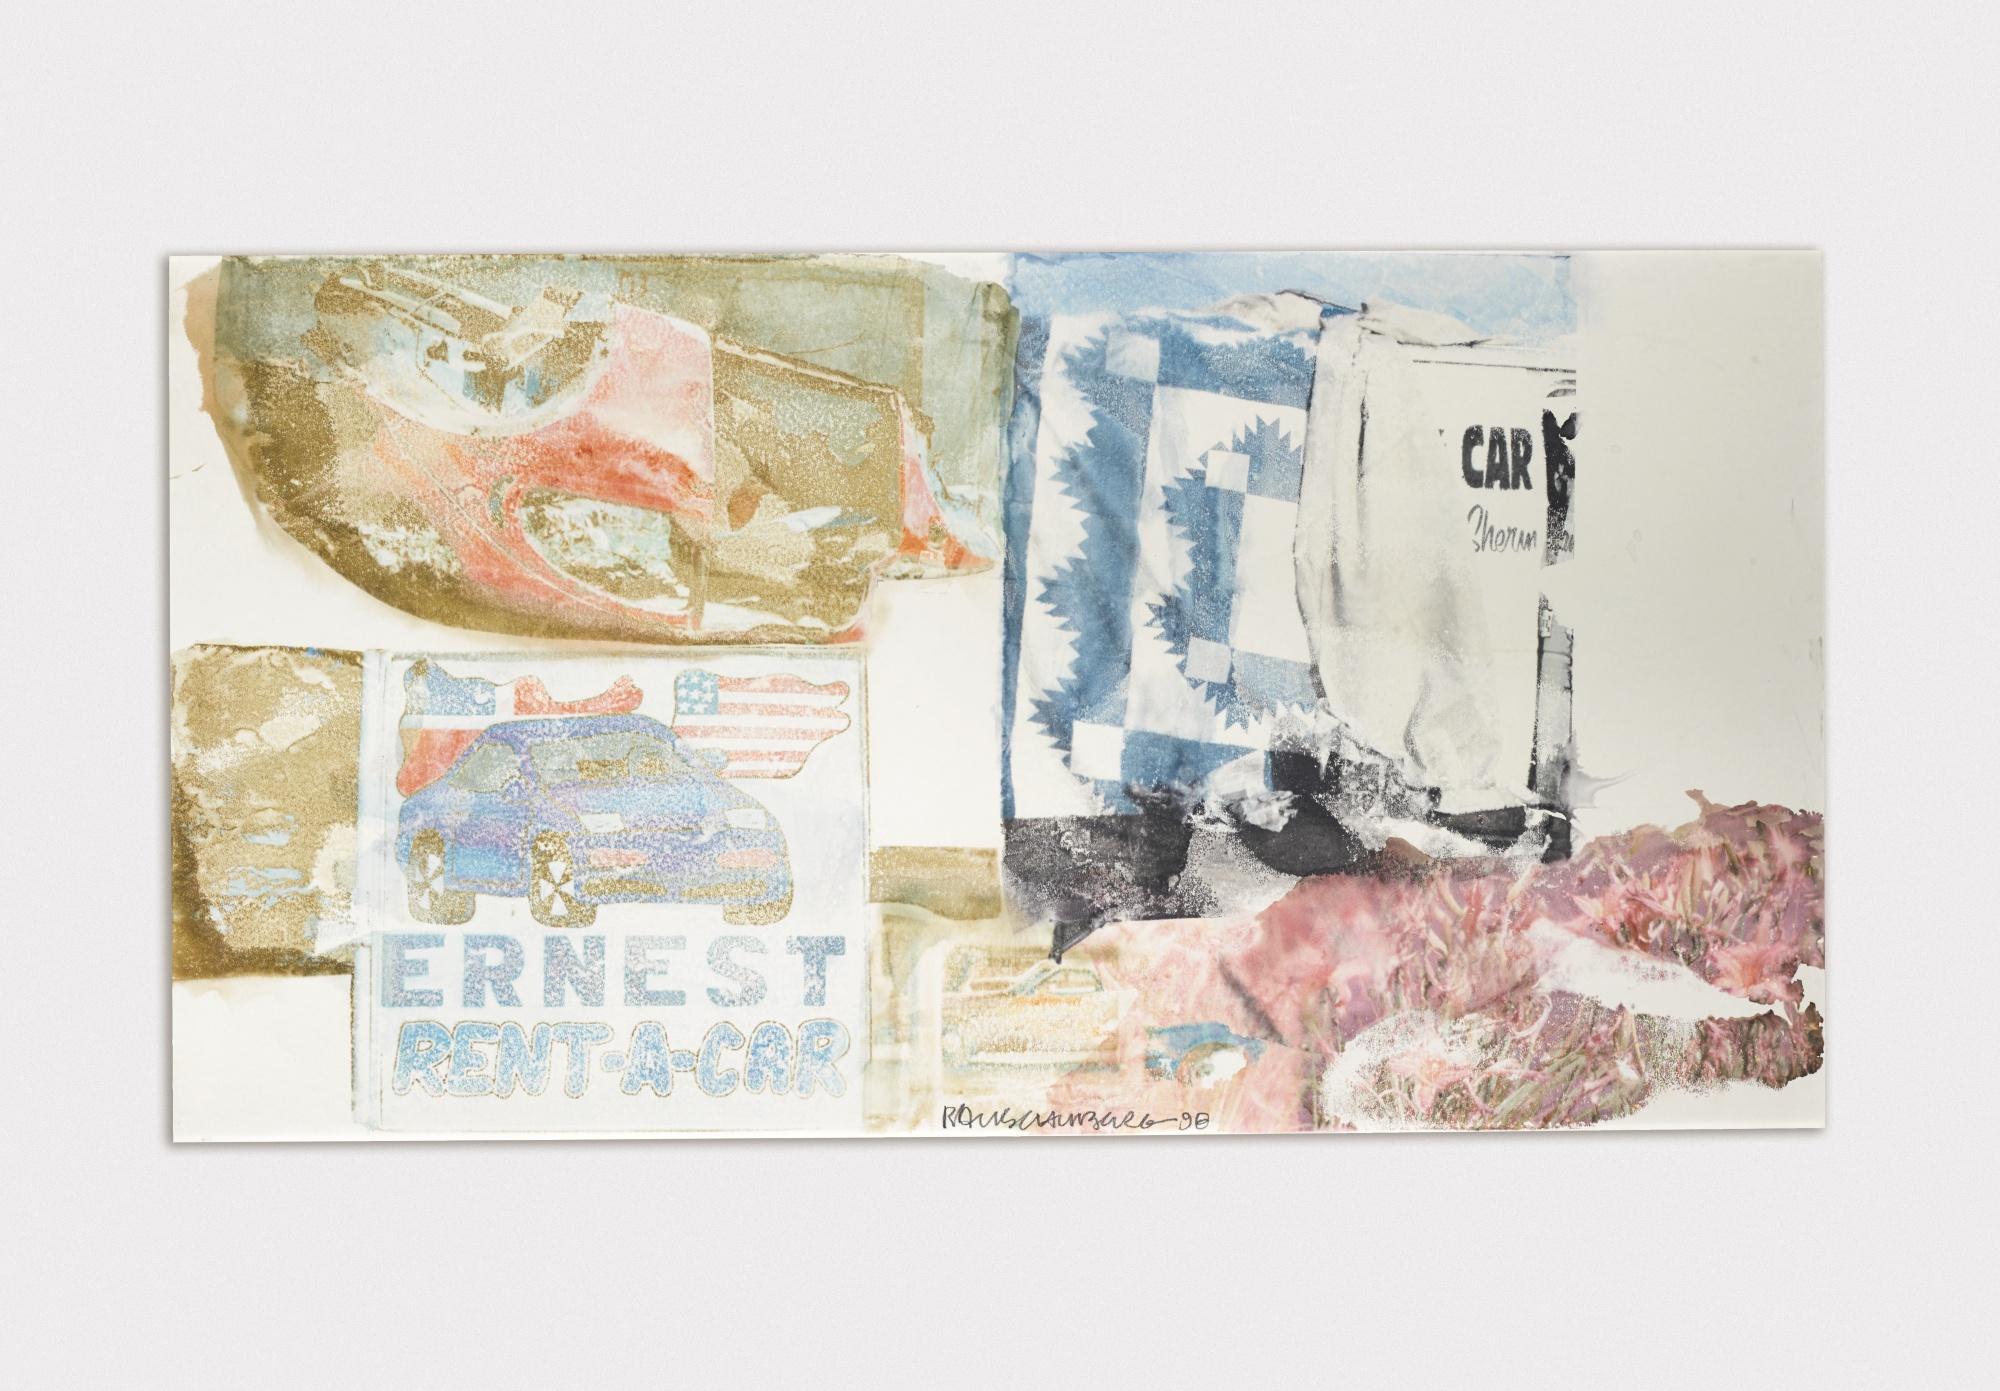 Robert Rauschenberg-Primer-1989